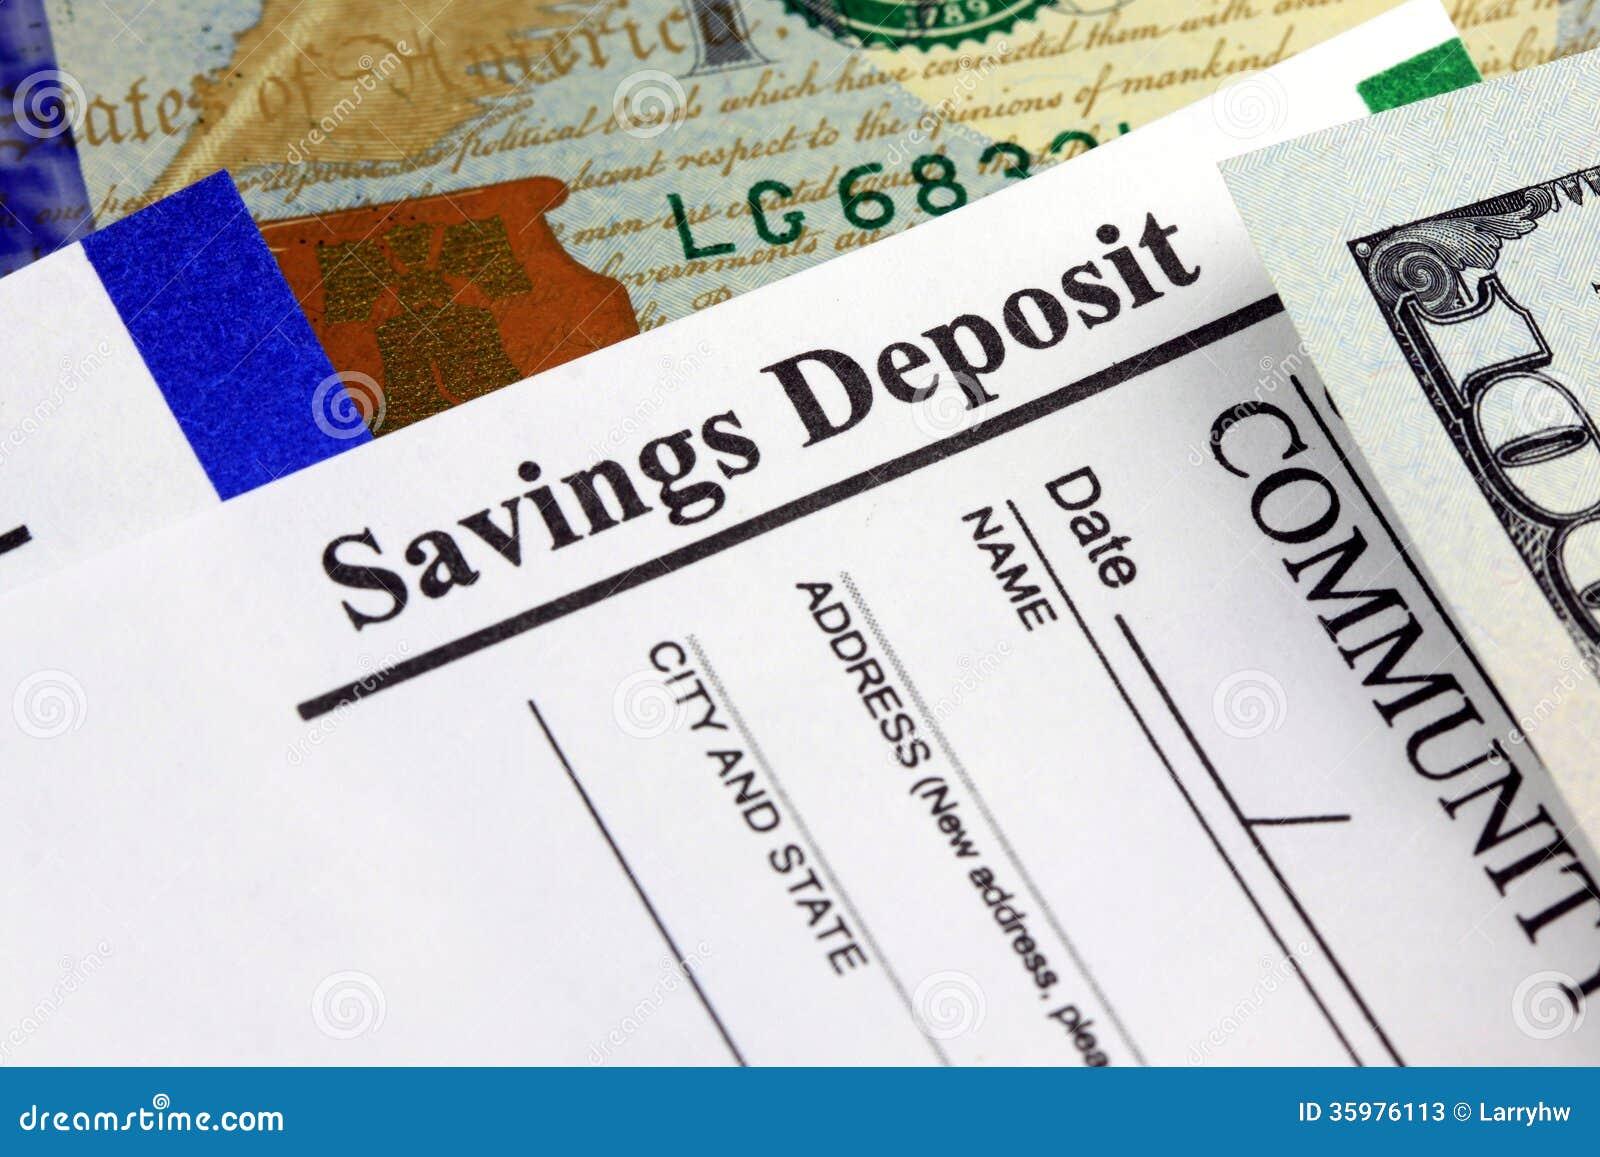 Free deposit accounts no deposit roulette bonus